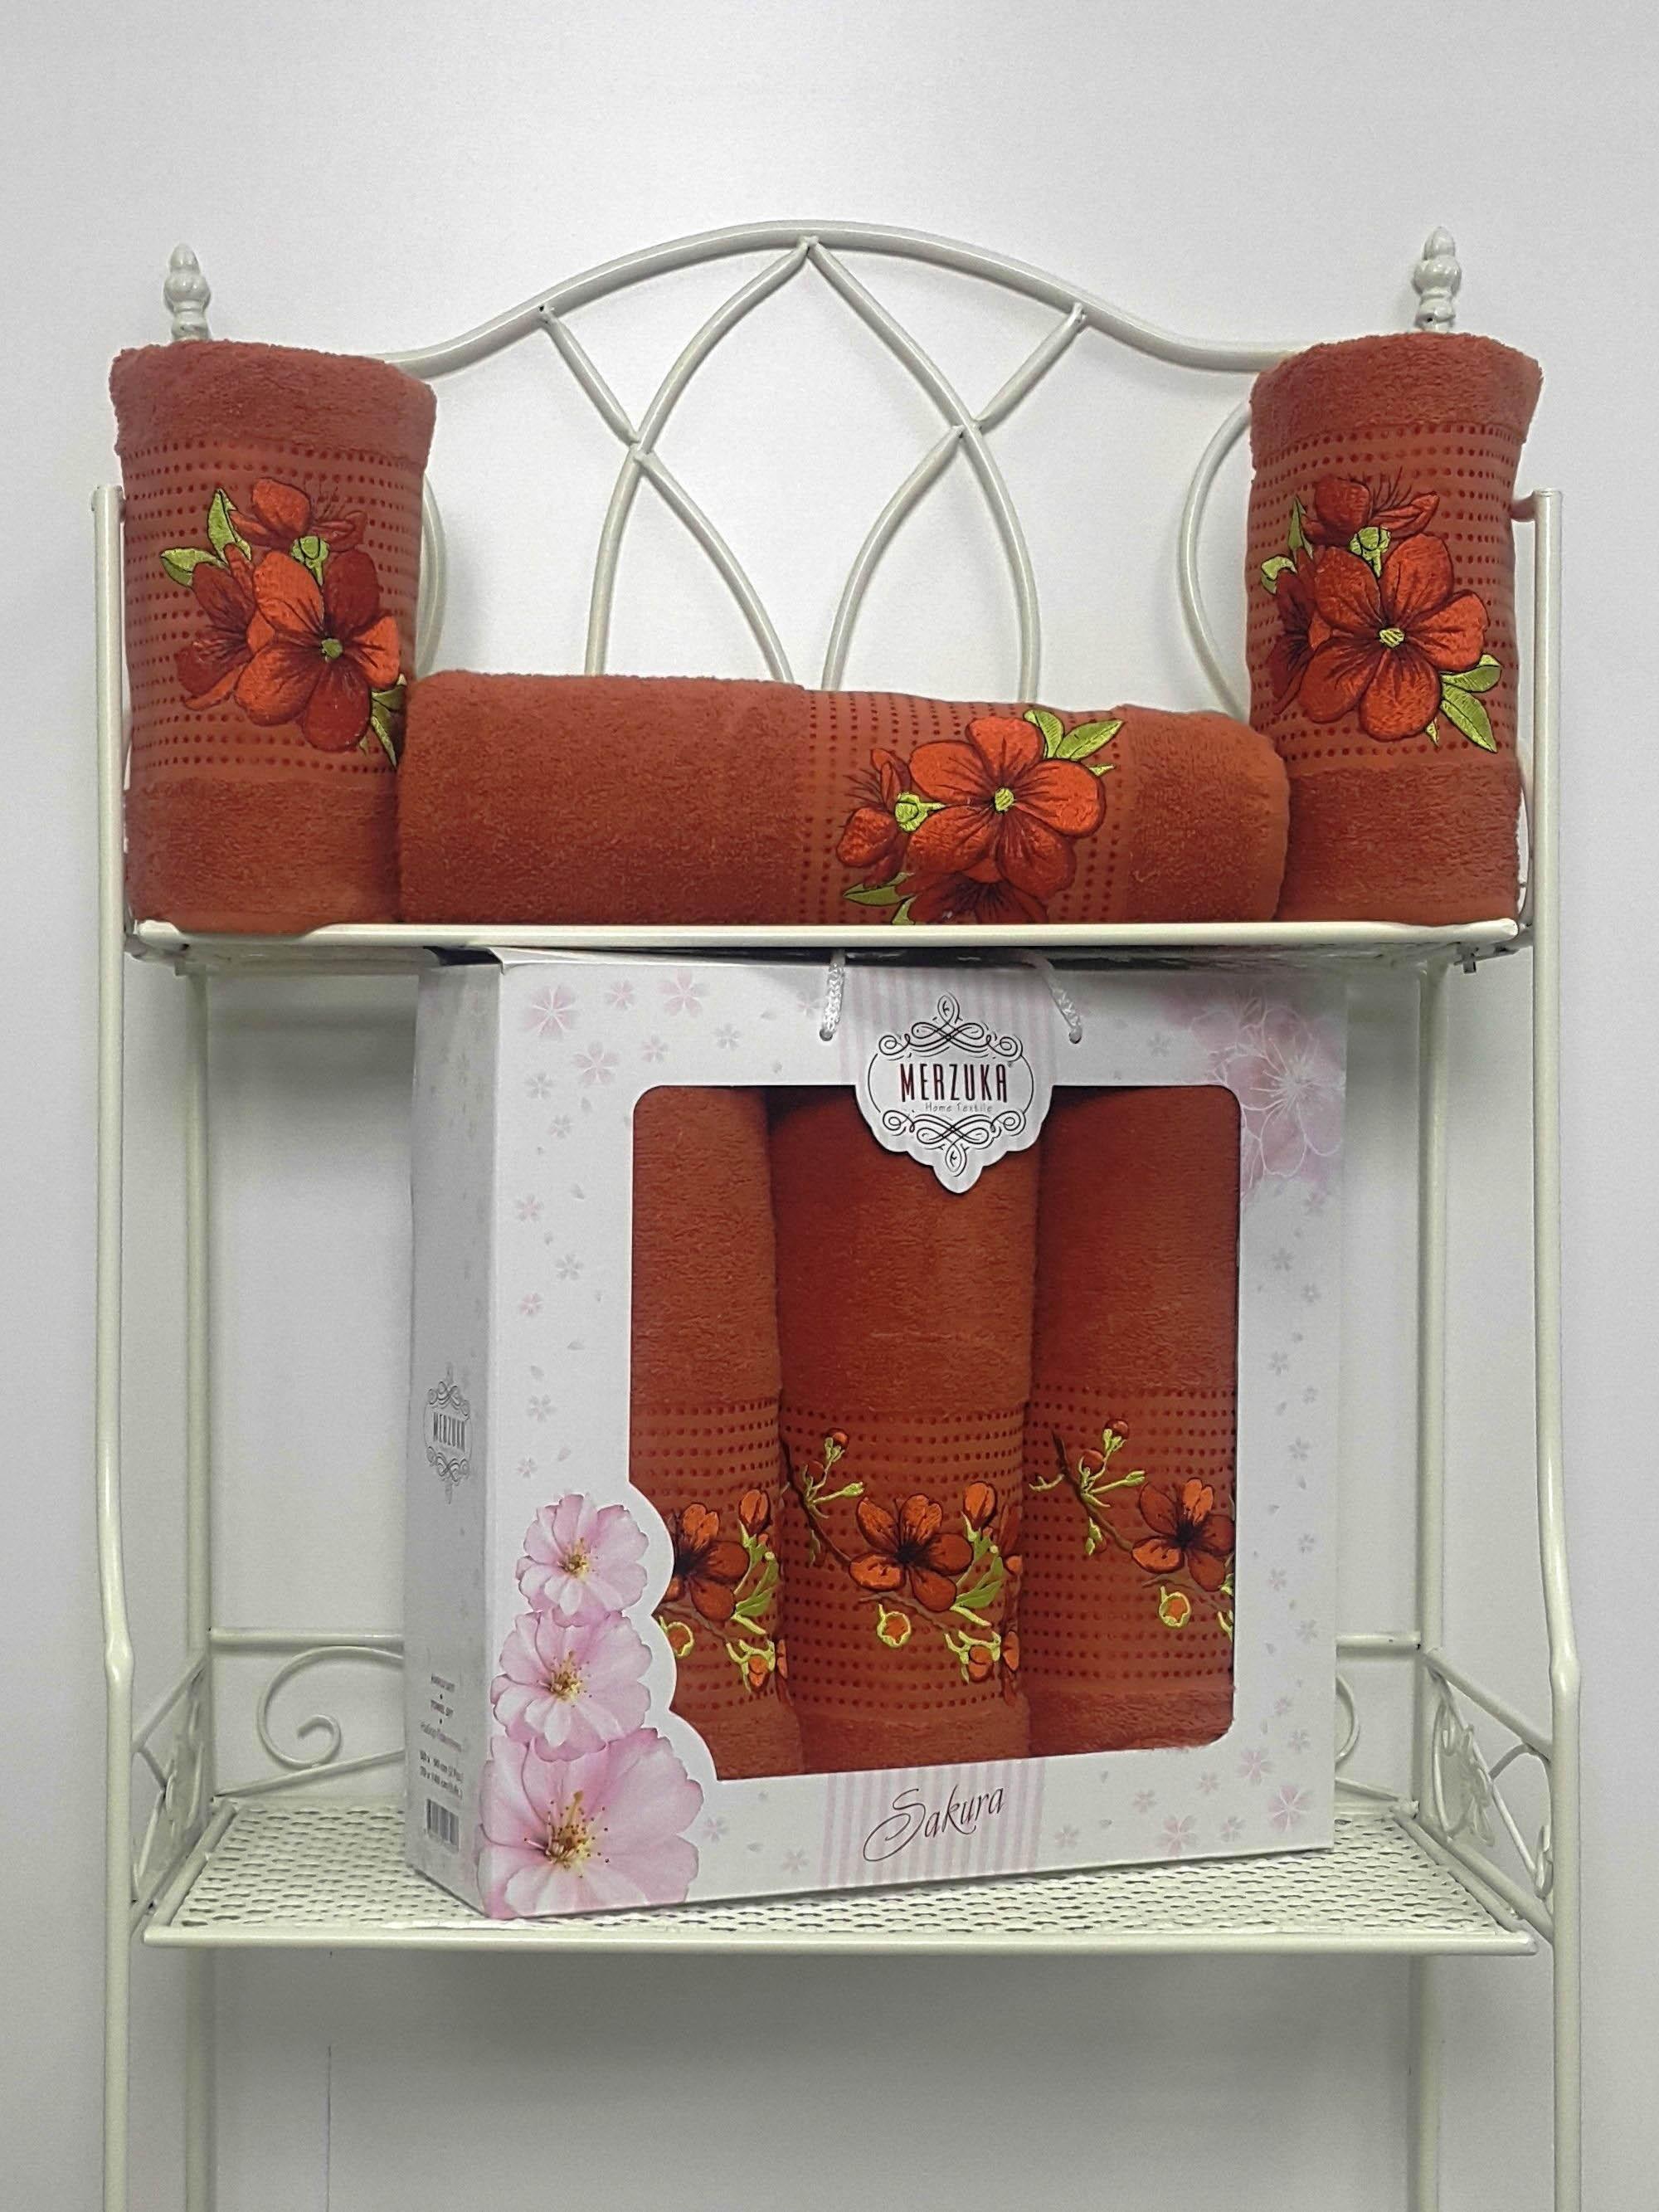 Полотенца Oran Merzuka Полотенце Sakura Цвет: Терракотовый (Набор) набор из 3 полотенец merzuka sakura 50х90 2 70х140 8432 розовый